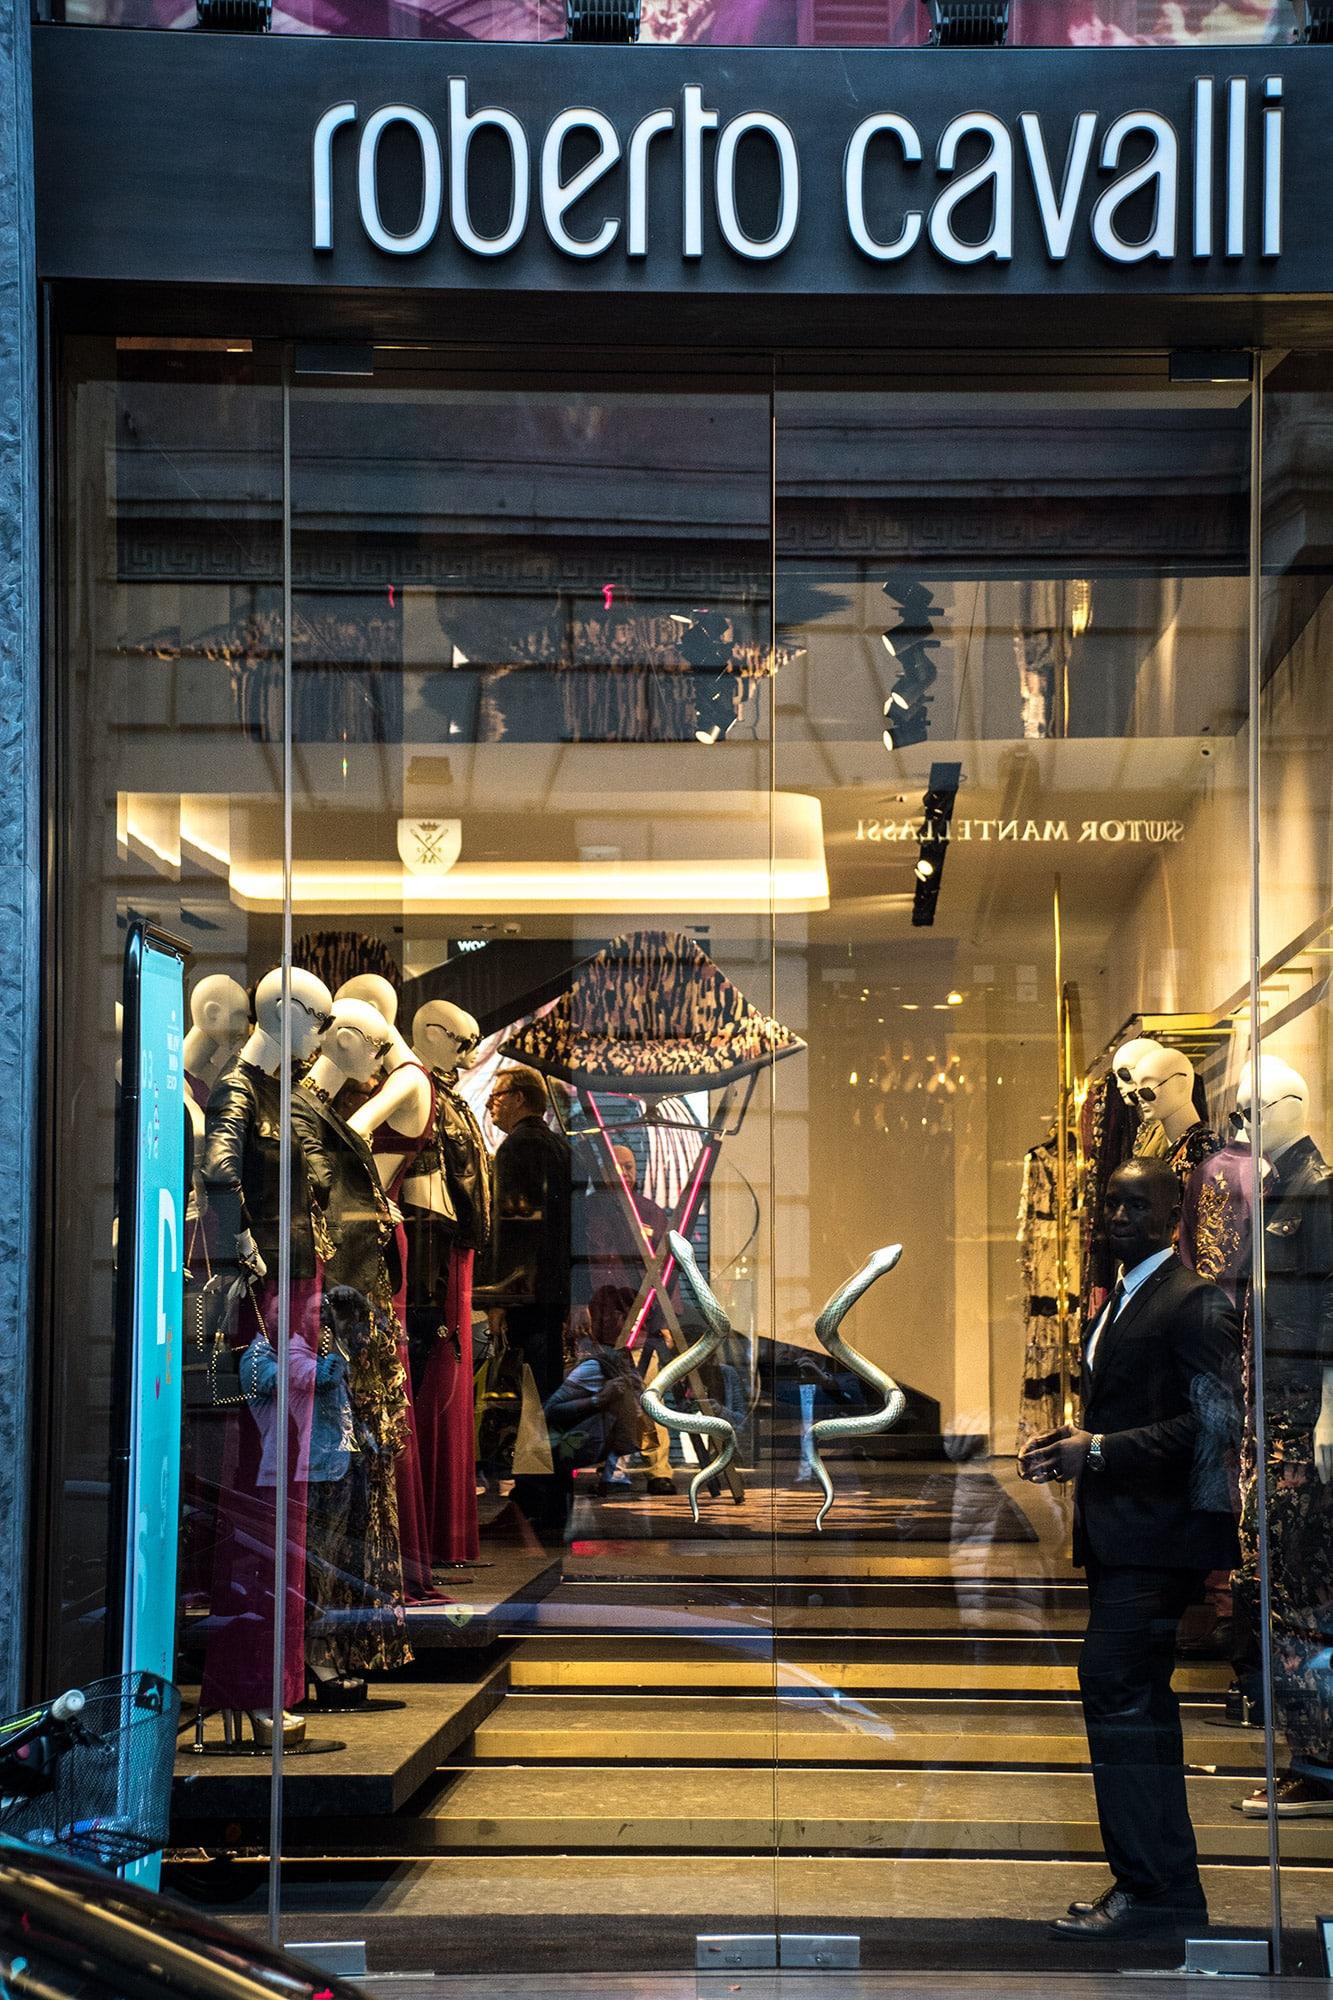 DSC 6057 min #общество Campari, wizzair, Брера, бутик, визы, Грузия, Дуомо, Италия, Кутаиси, Ла Скала, Милан, мода, шоппинг